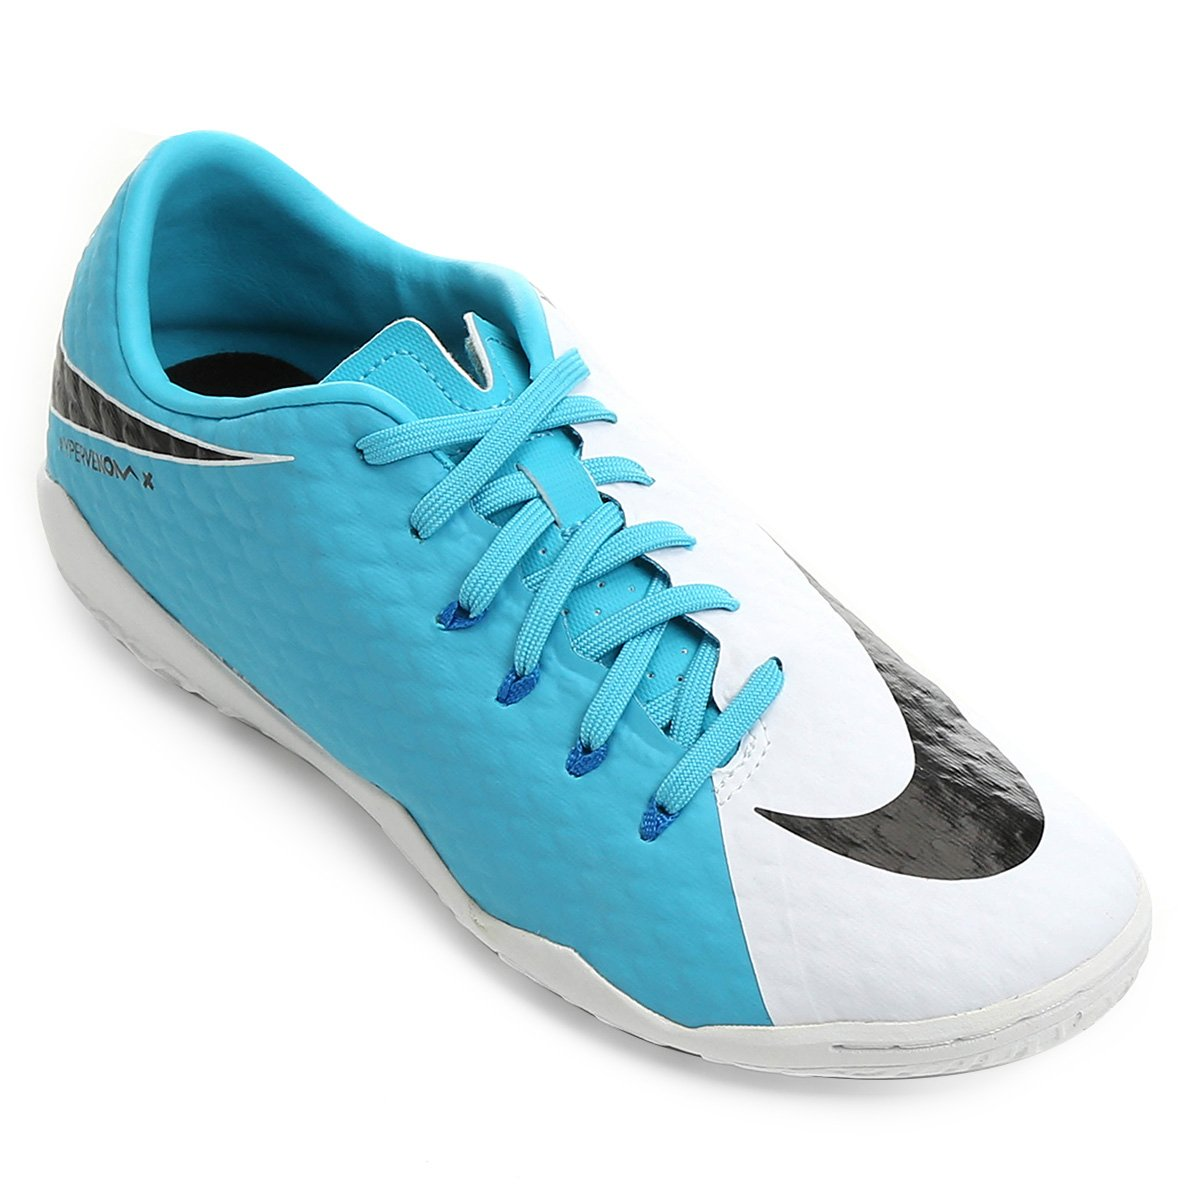 7b8f11b6d6 Chuteira Futsal Nike Hypervenom Phelon 3 IC